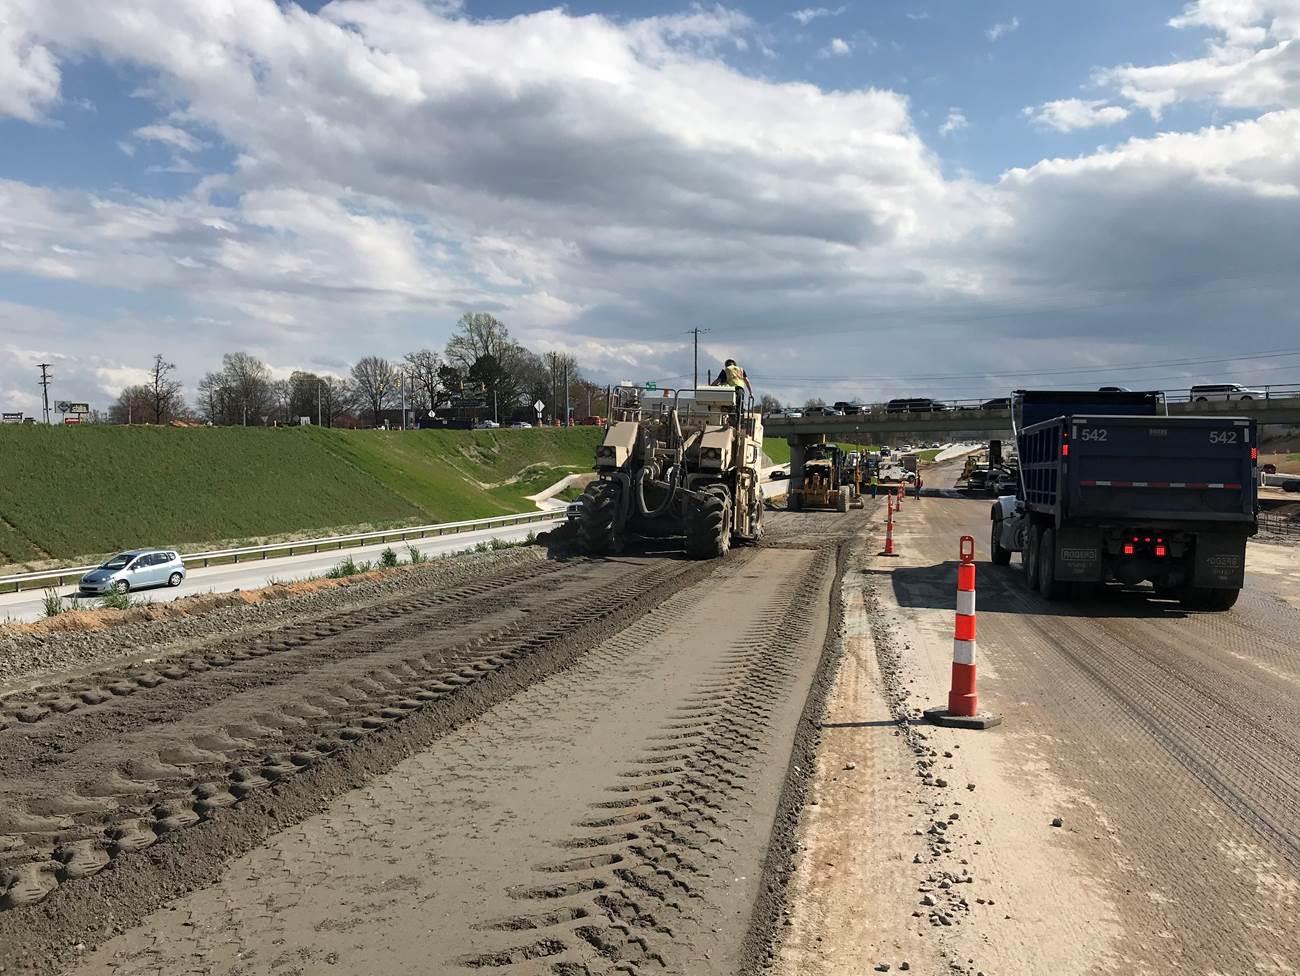 Gateway Project Work (Source: I-85/385 Gateway Project)